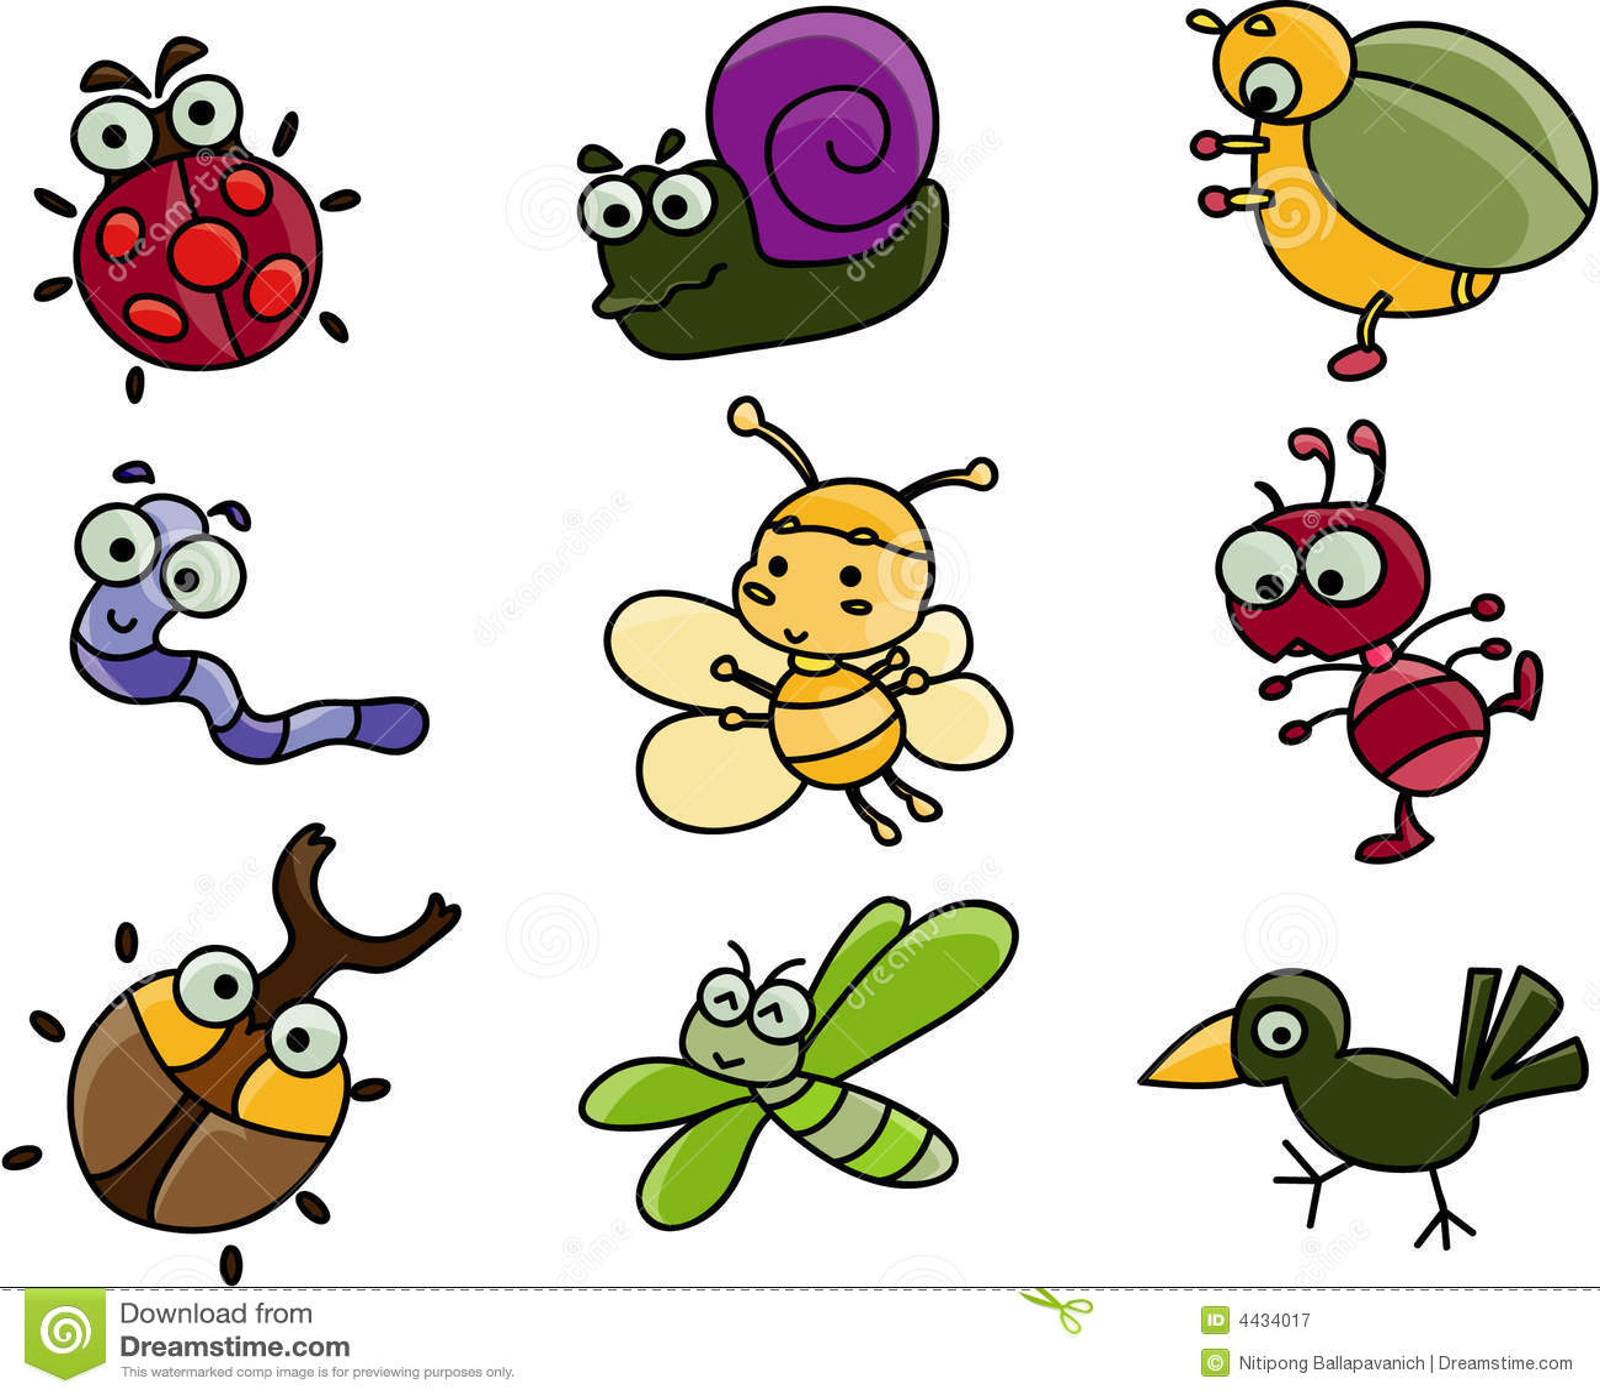 Cartoon Bug Collection Clipart